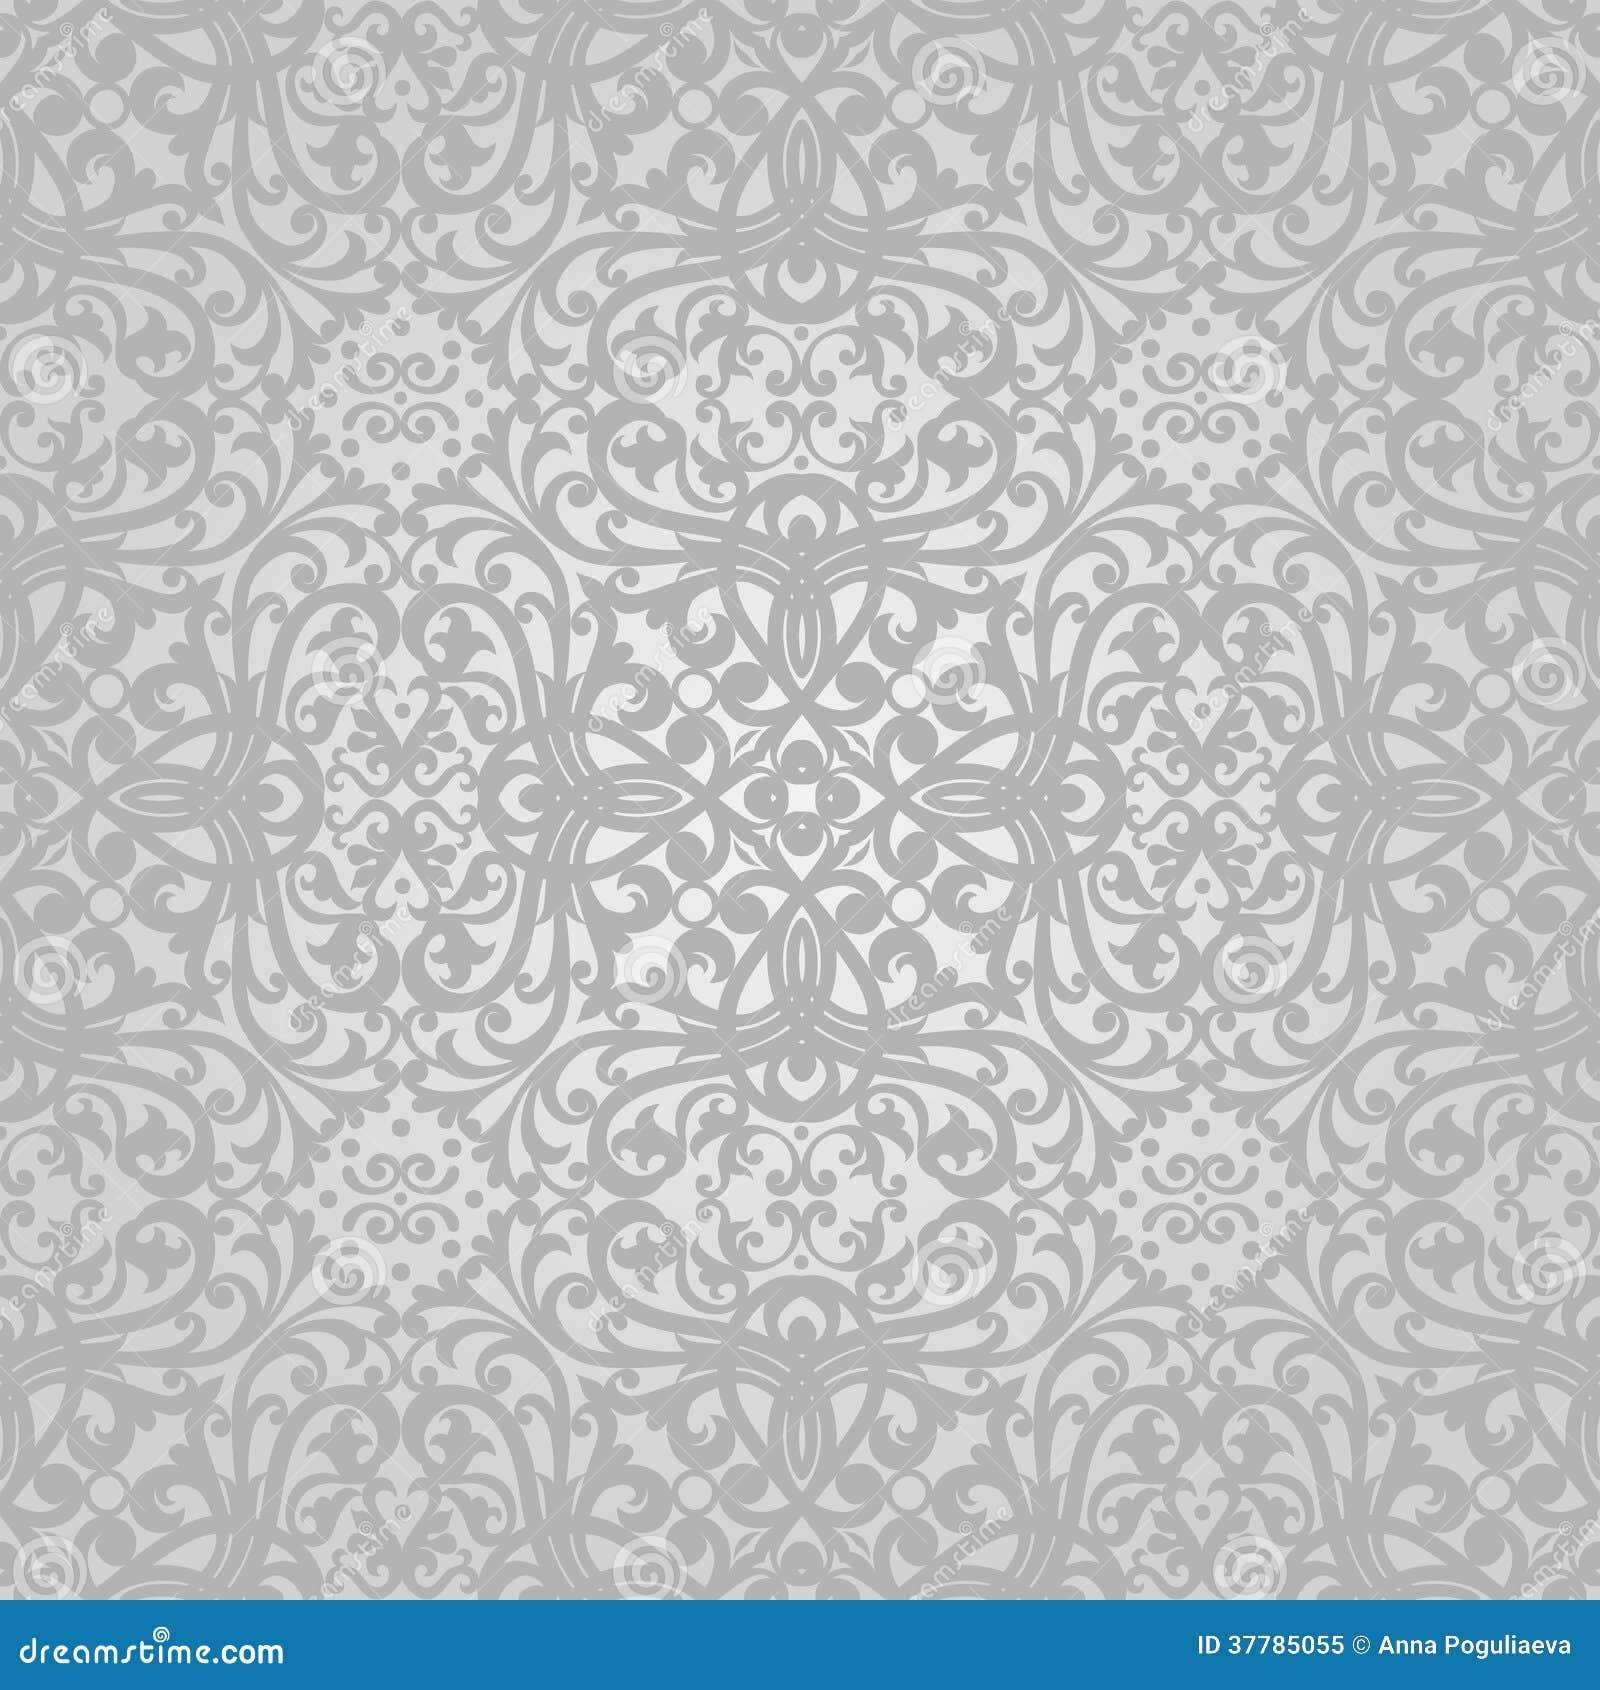 grey vintage wallpaper - photo #18